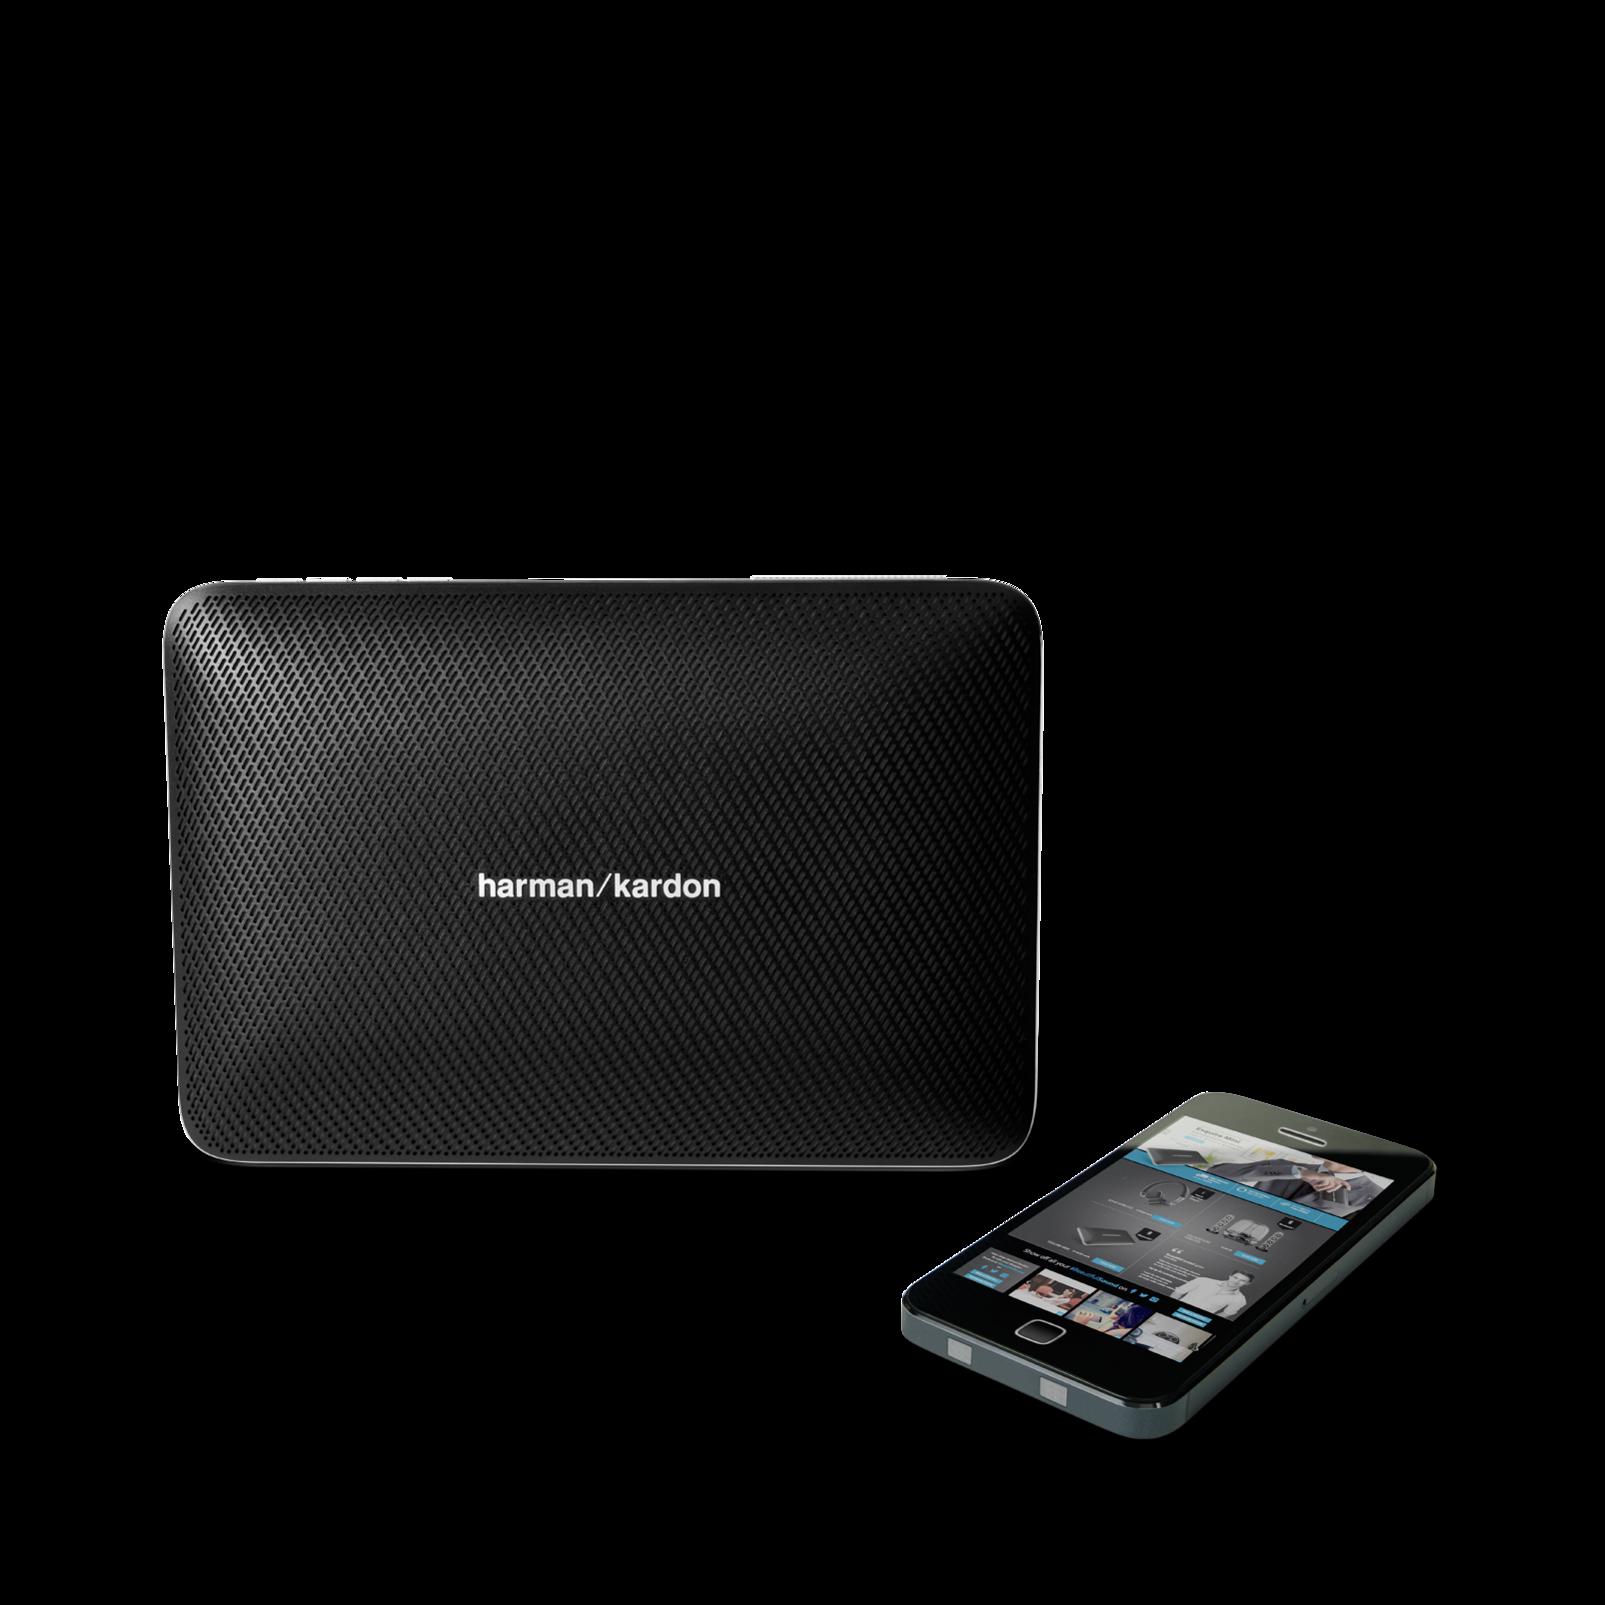 Esquire 2 - Black - Premium portable Bluetooth speaker with quad microphone conferencing system - Detailshot 5